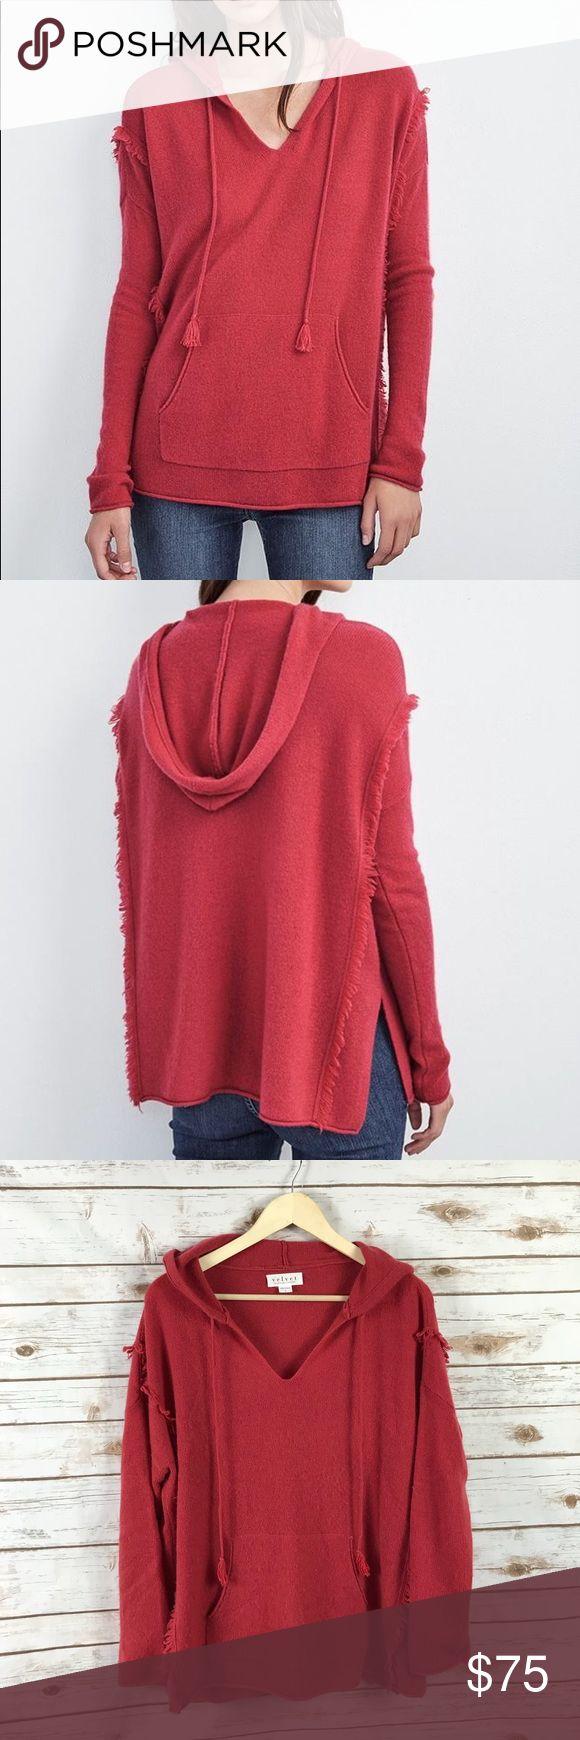 "Velvet by Graham & Spencer Jacqueline Sweater Velvet by Graham and Spencer size large, red Jacqueline cashmere fringe hoodie. EUC. 100% Cashmere. •Underarm to Underarm= 27"" •Length= 28.5"" Velvet by Graham & Spencer Sweaters"